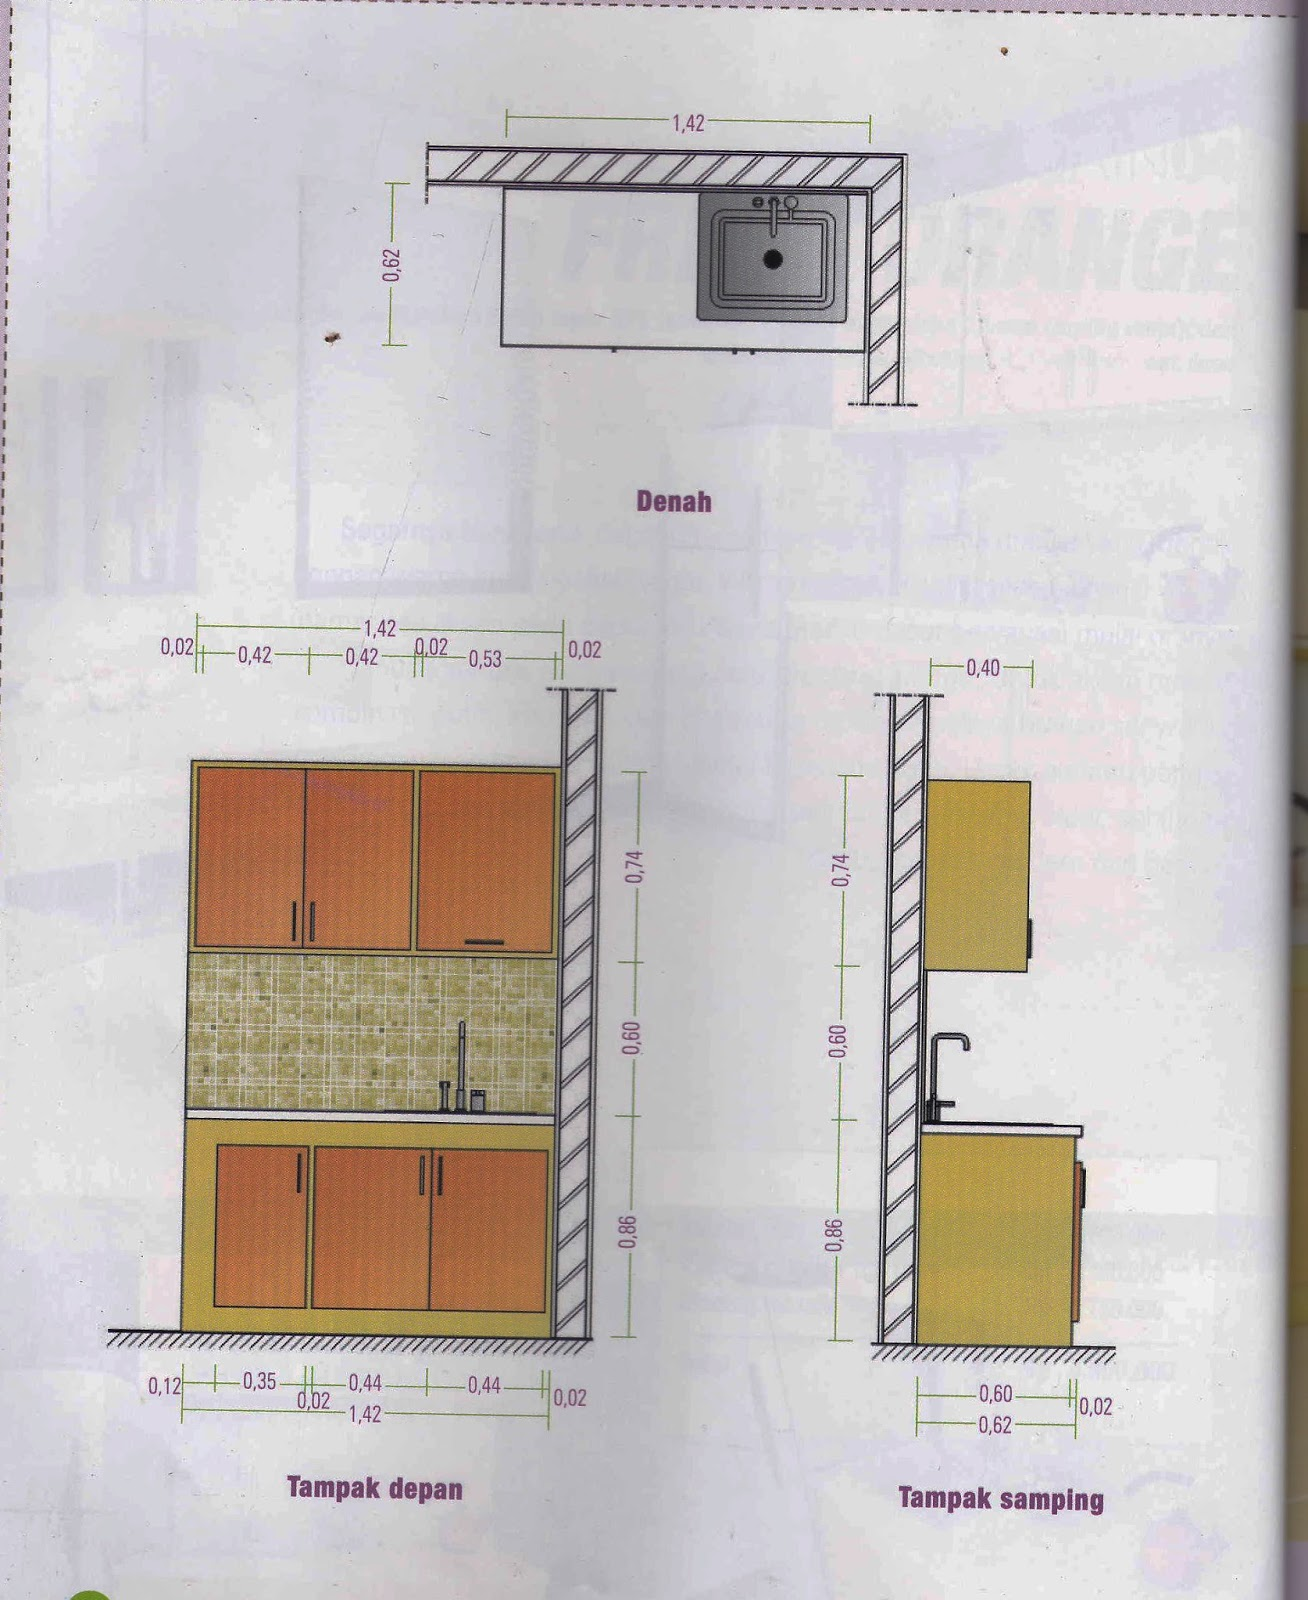 Desain Kitchen Set Warna Orange Minimalis 4 95 Juta Untuk Dapur